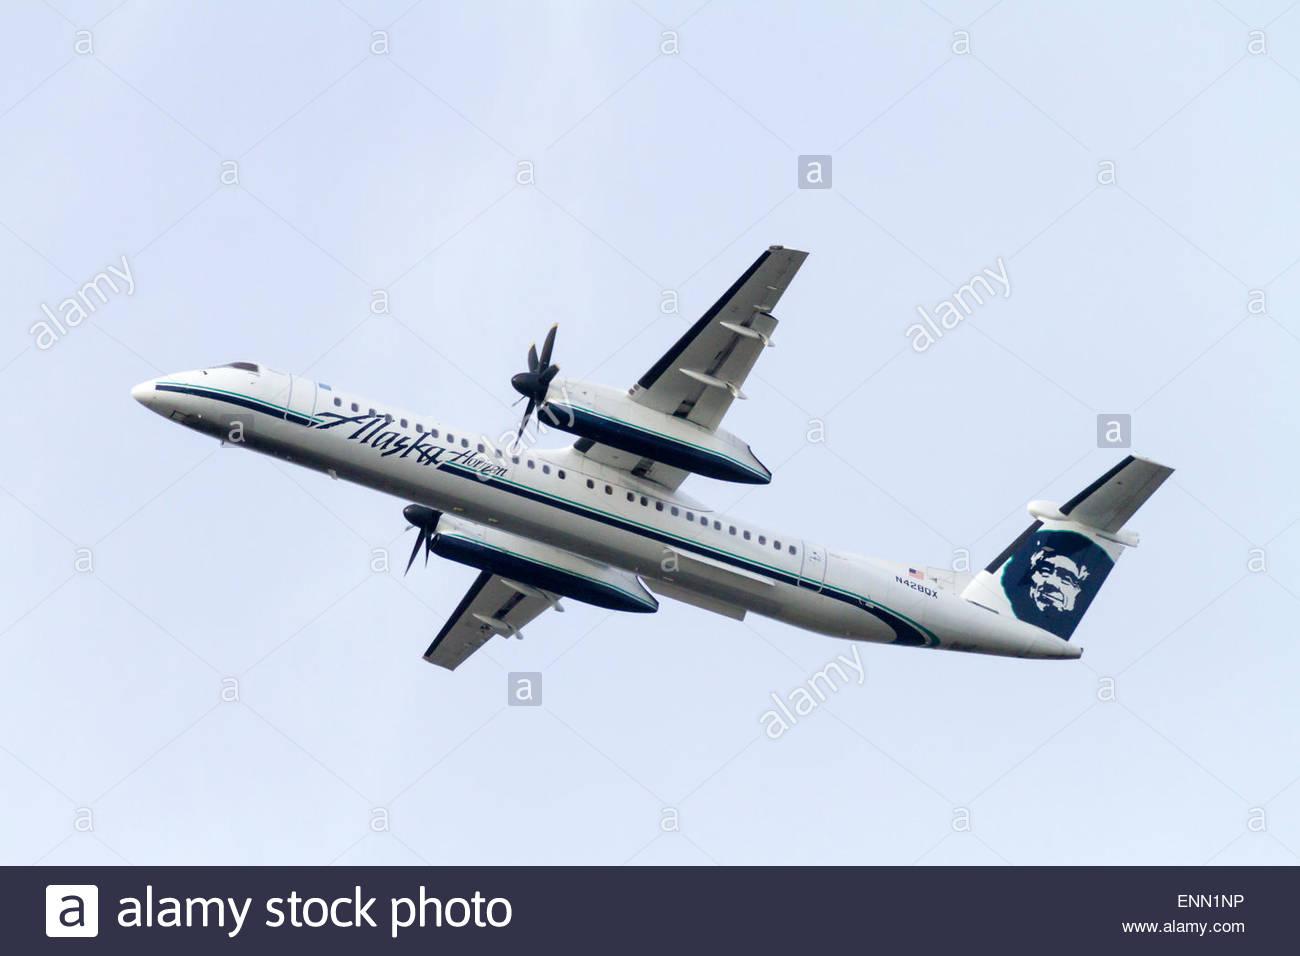 An Alaska Airline Horizon Bombardier Q400 Turbo Prop